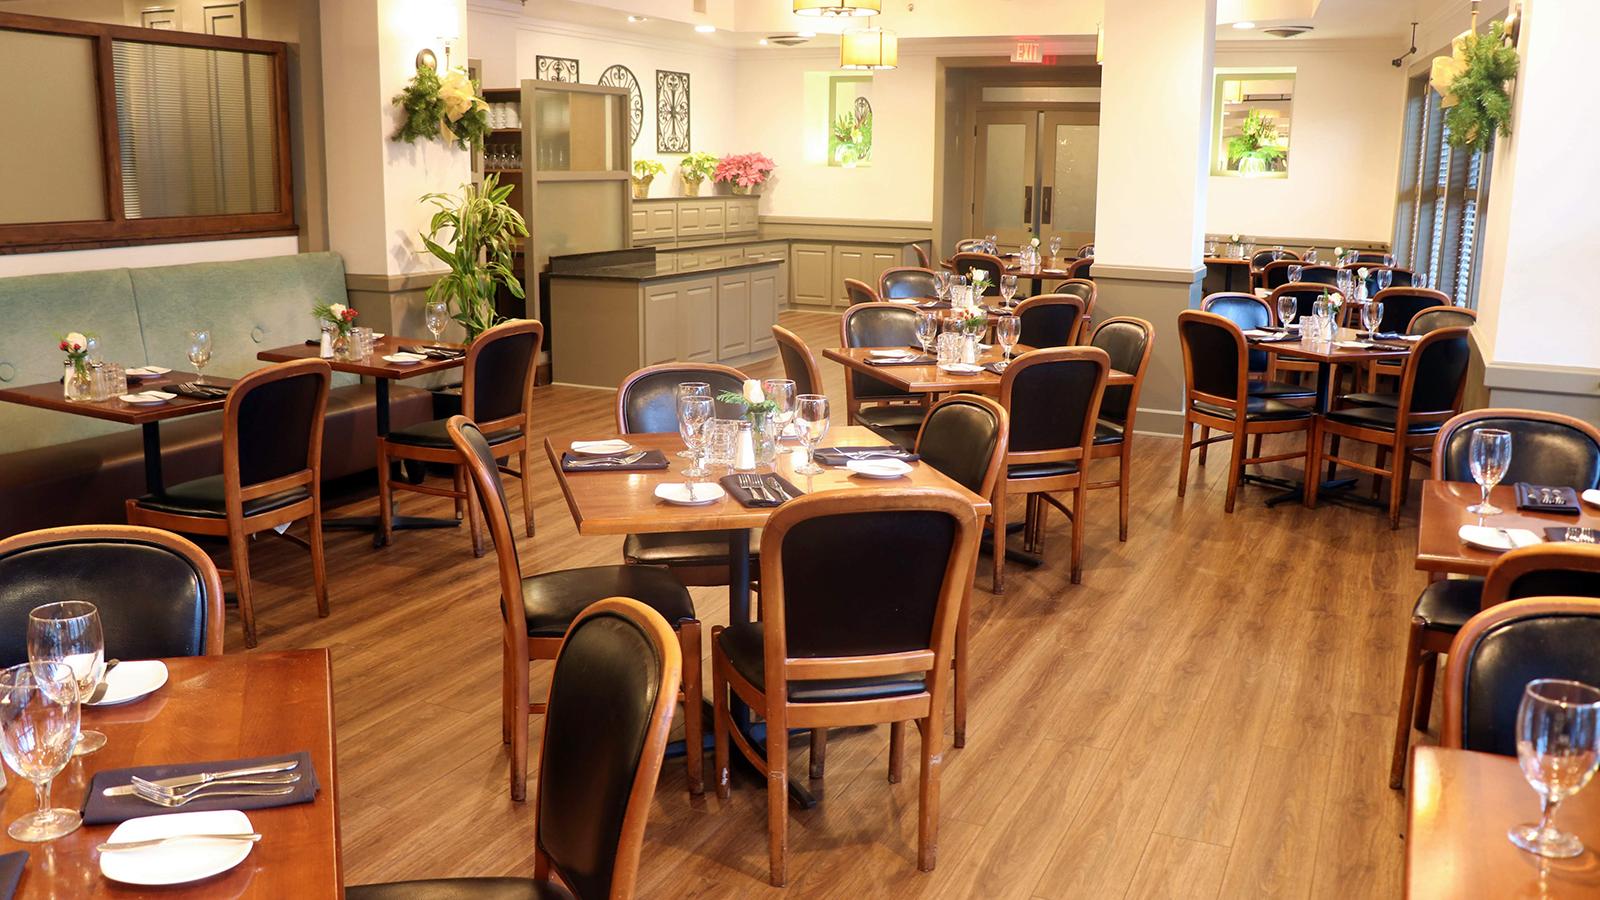 Image of Swamp Fox Restaurant at Francis Marion Hotel, 1924, Member of Historic Hotels of America, in Charleston, South Carolina, Taste